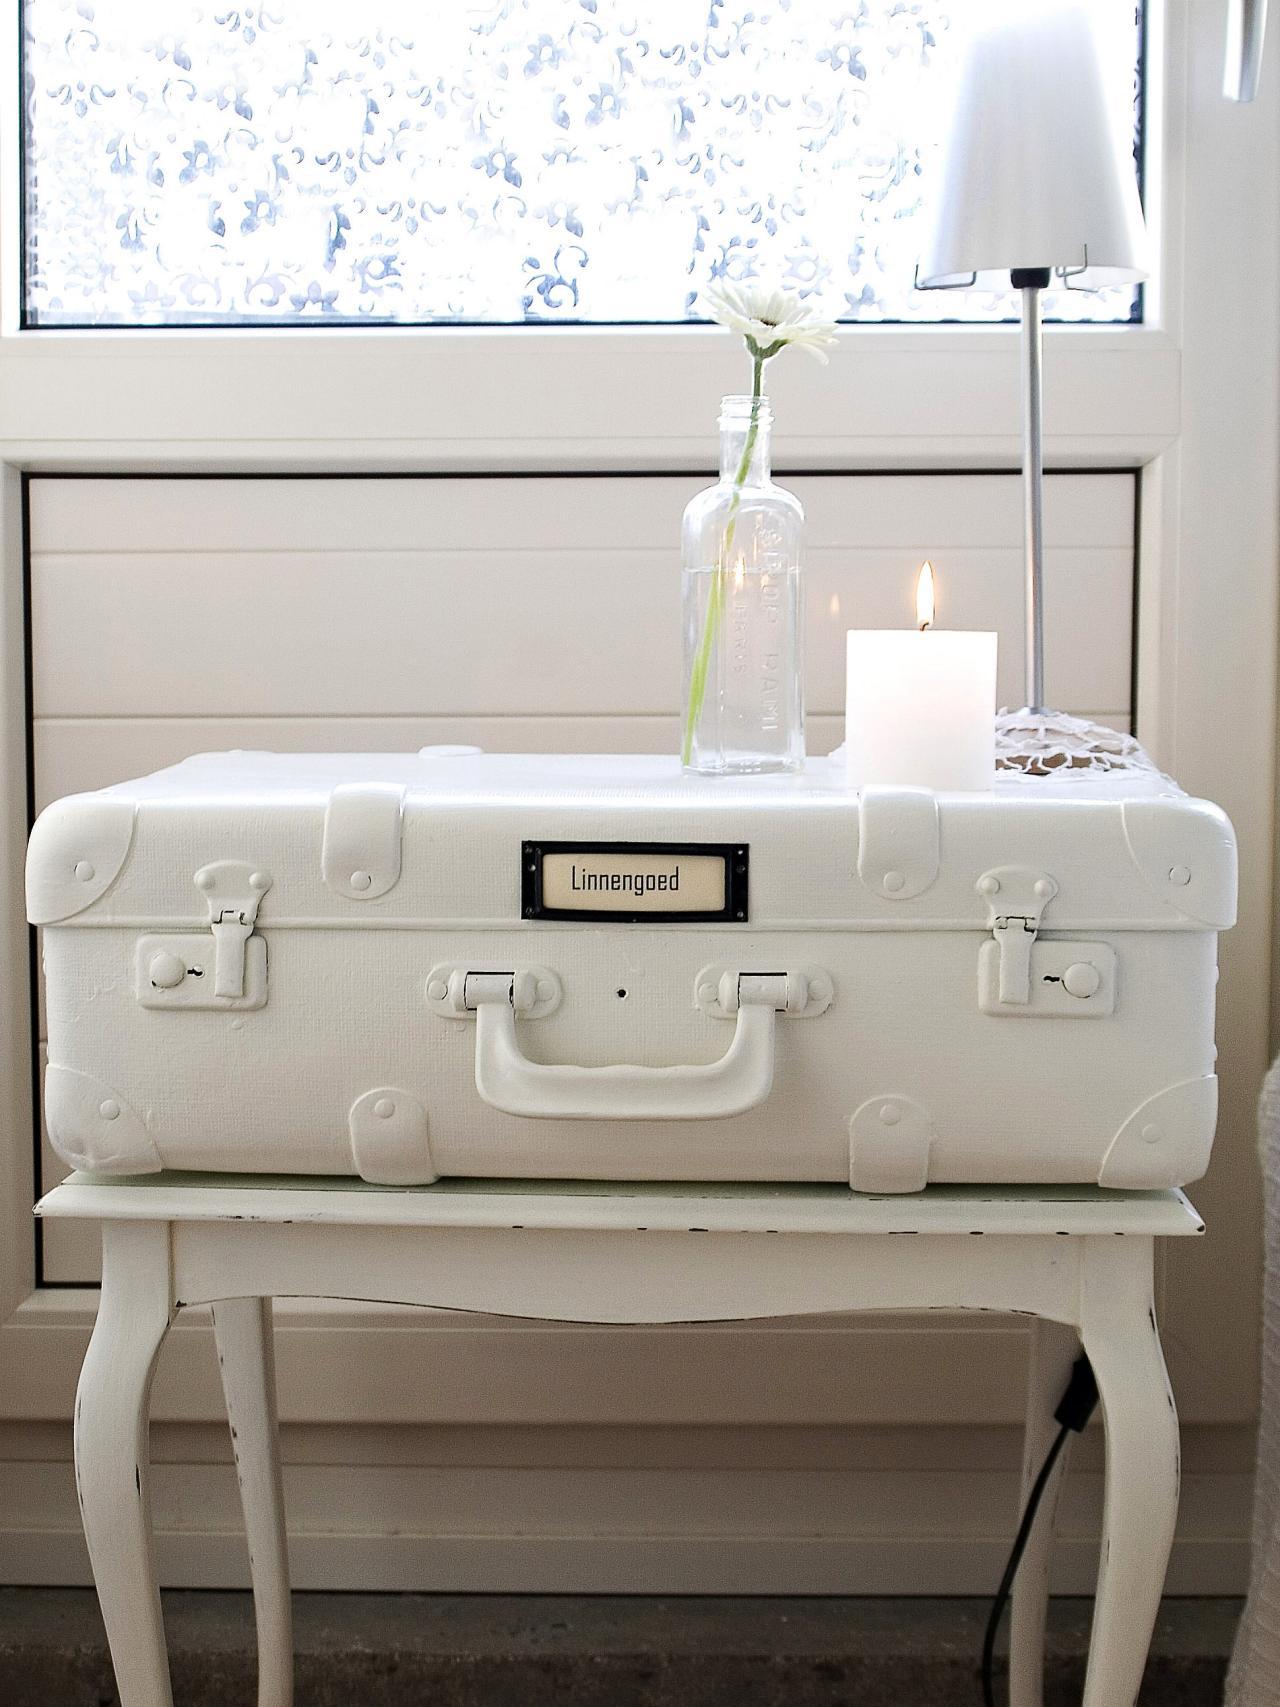 Transform Your Bedroom With DIY Decor   Bedrooms & Bedroom ...